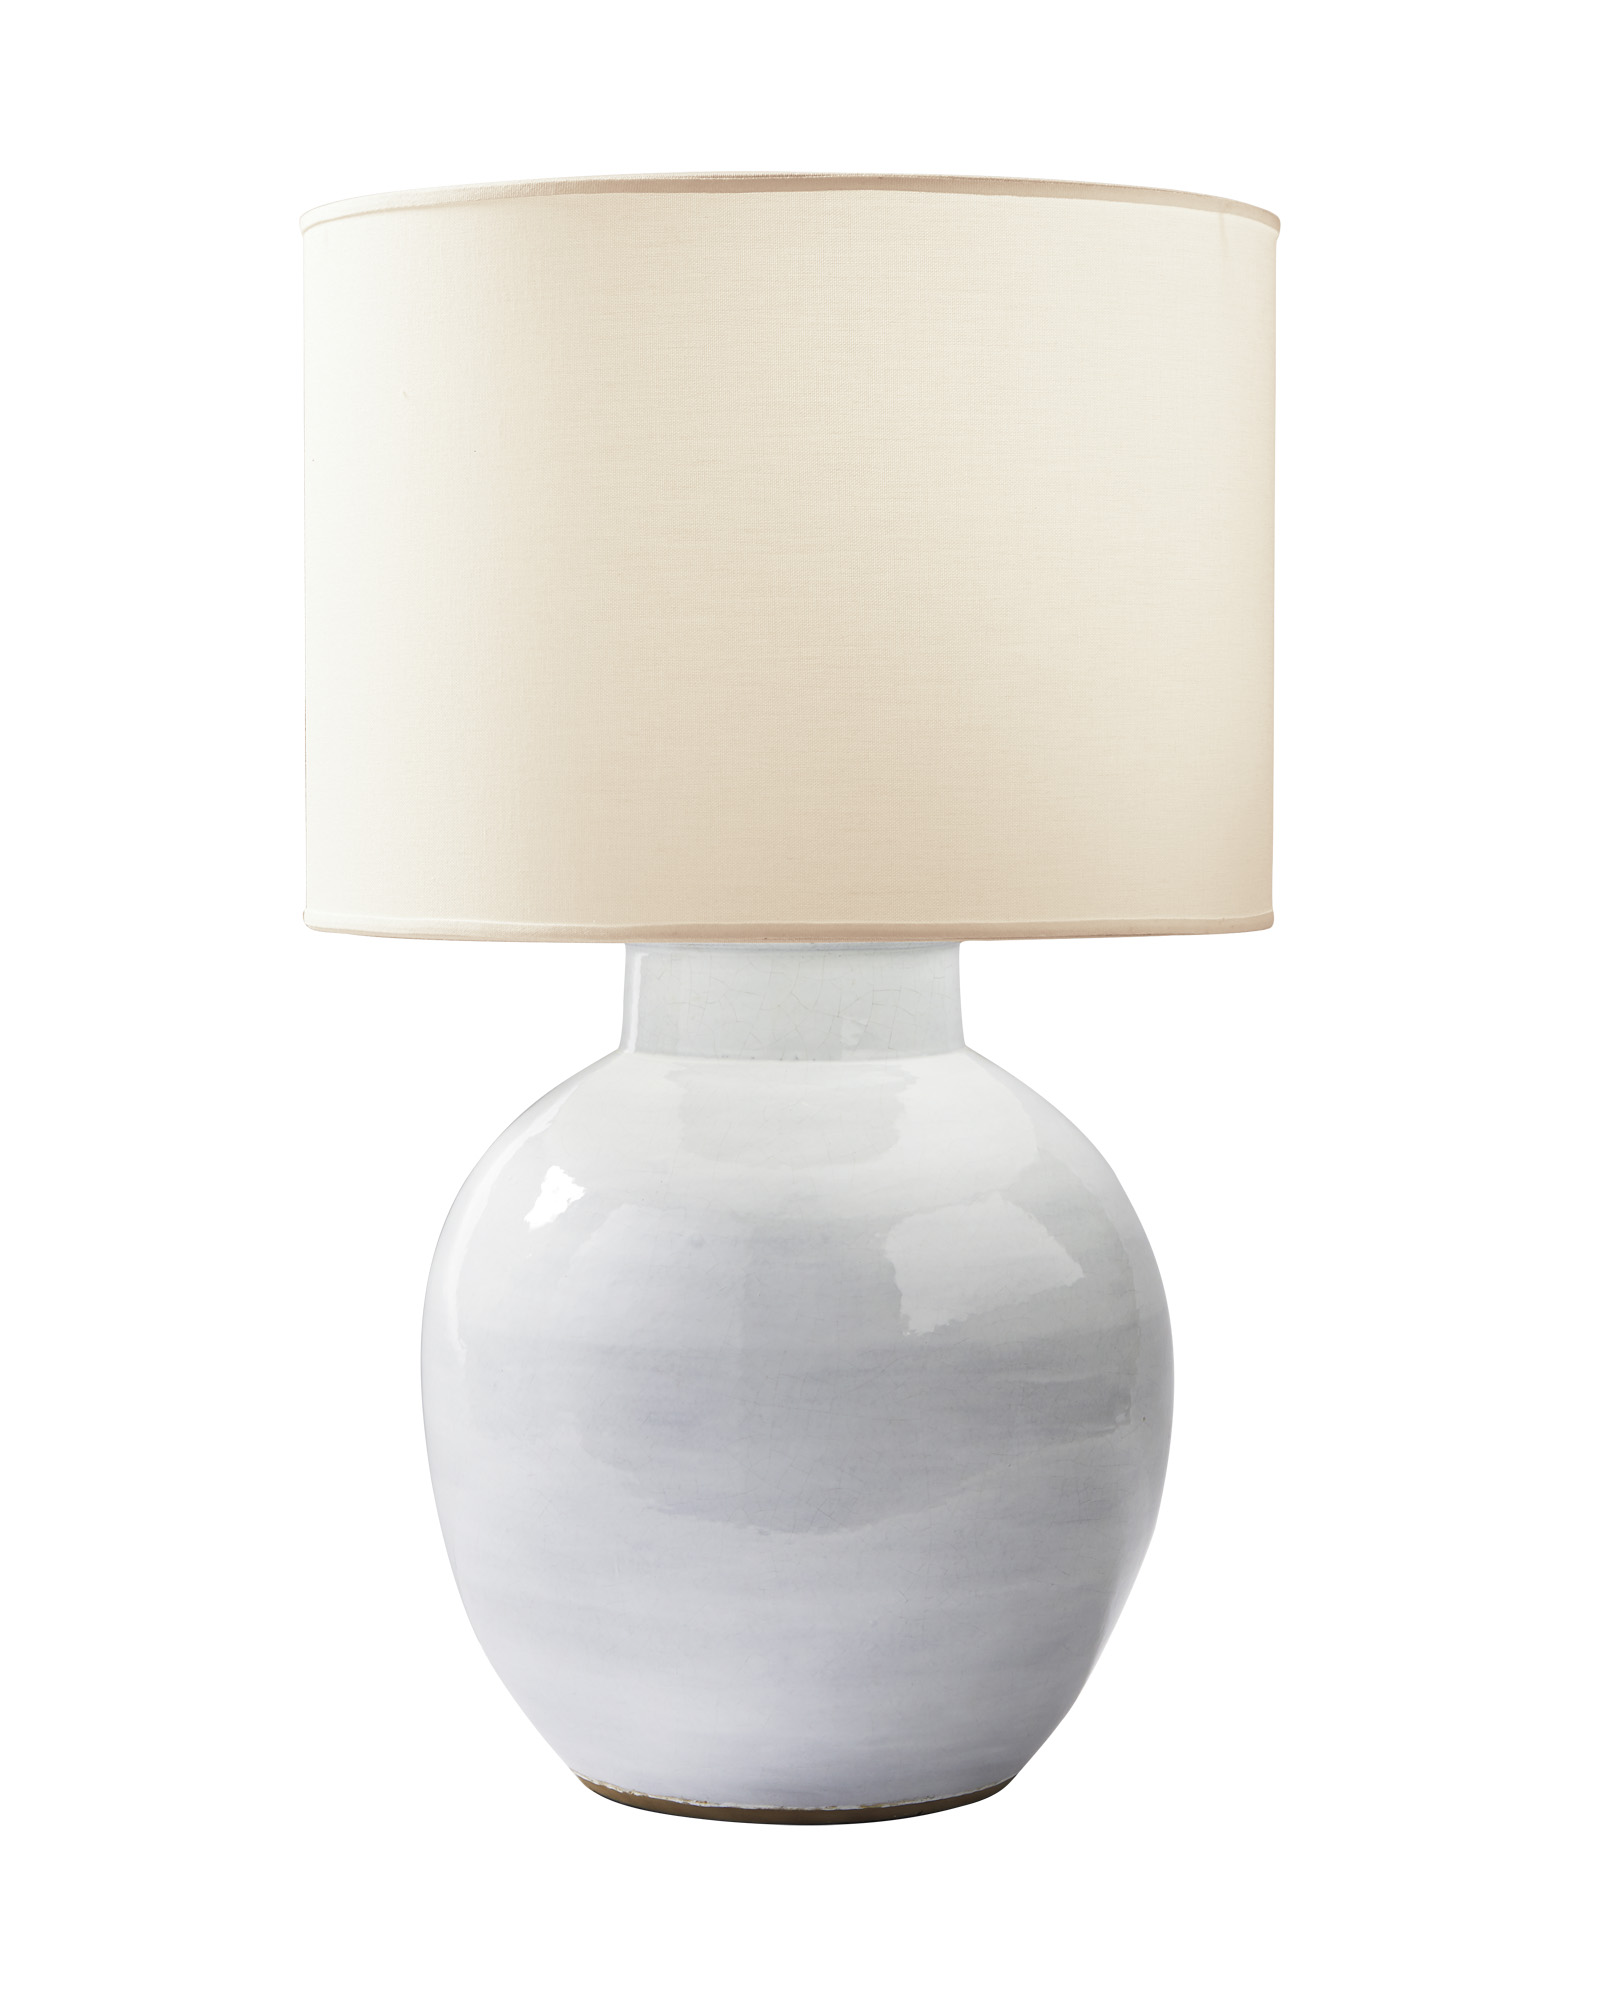 Morris Table Lamp - White